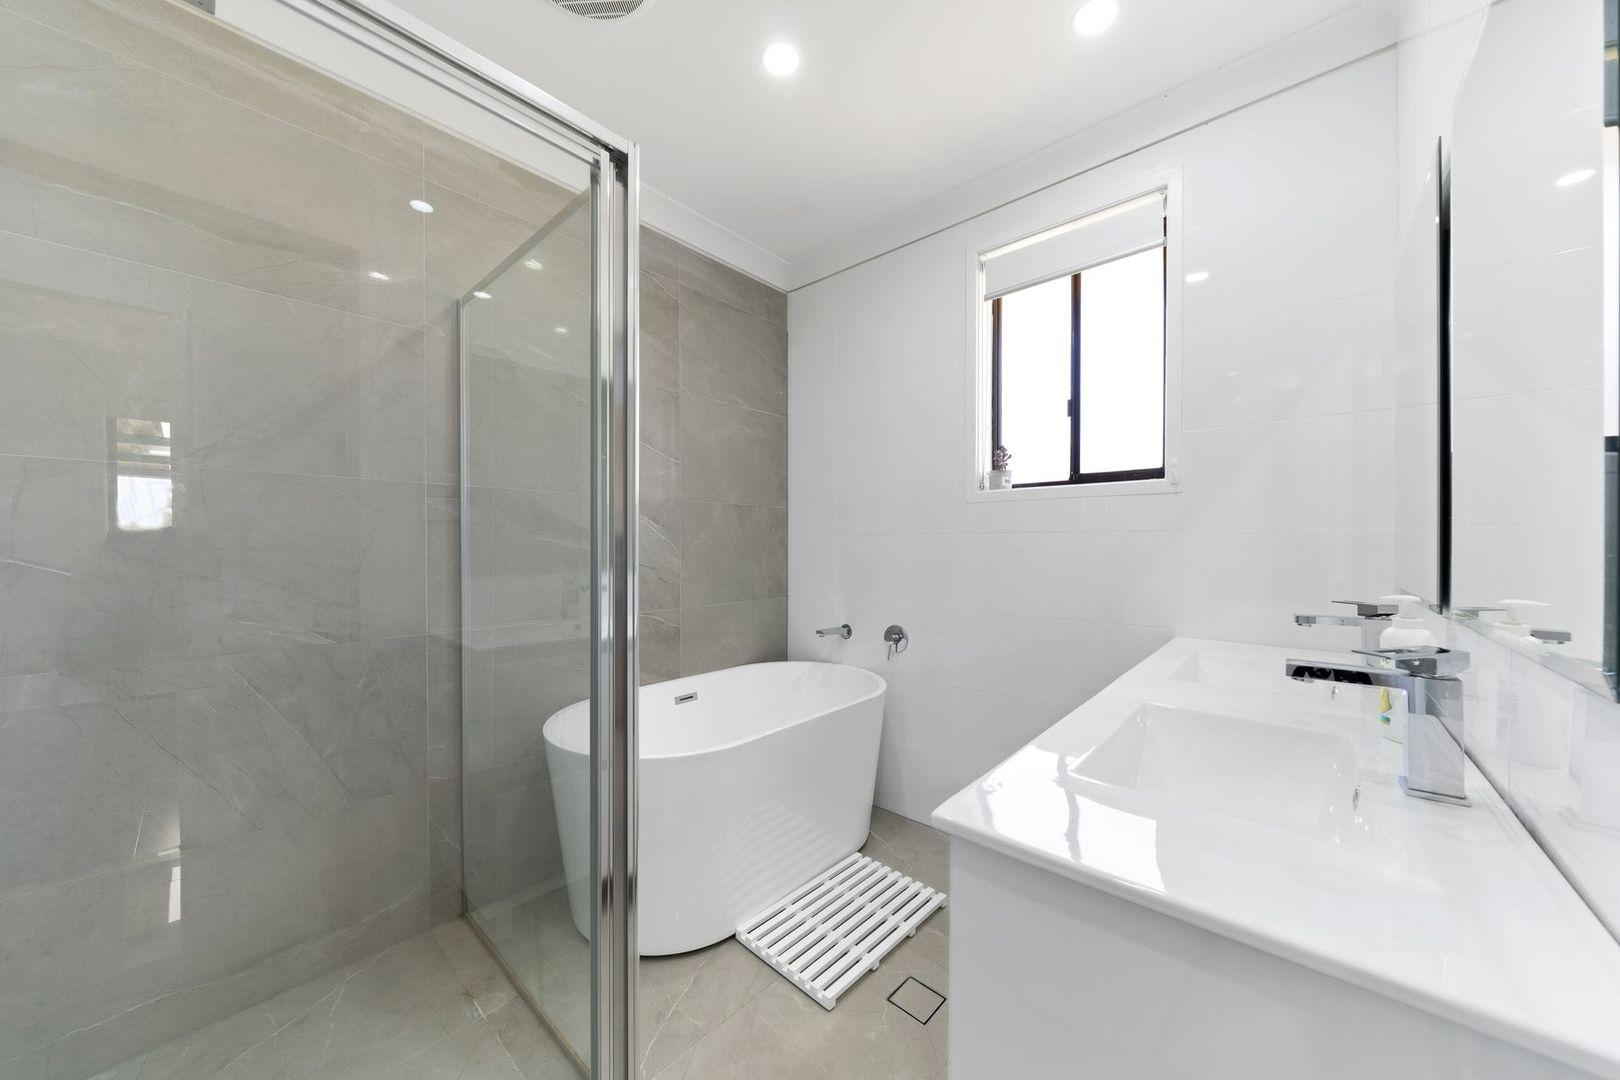 Lot 2/10 Eleventh Avenue, Austral NSW 2179, Image 2